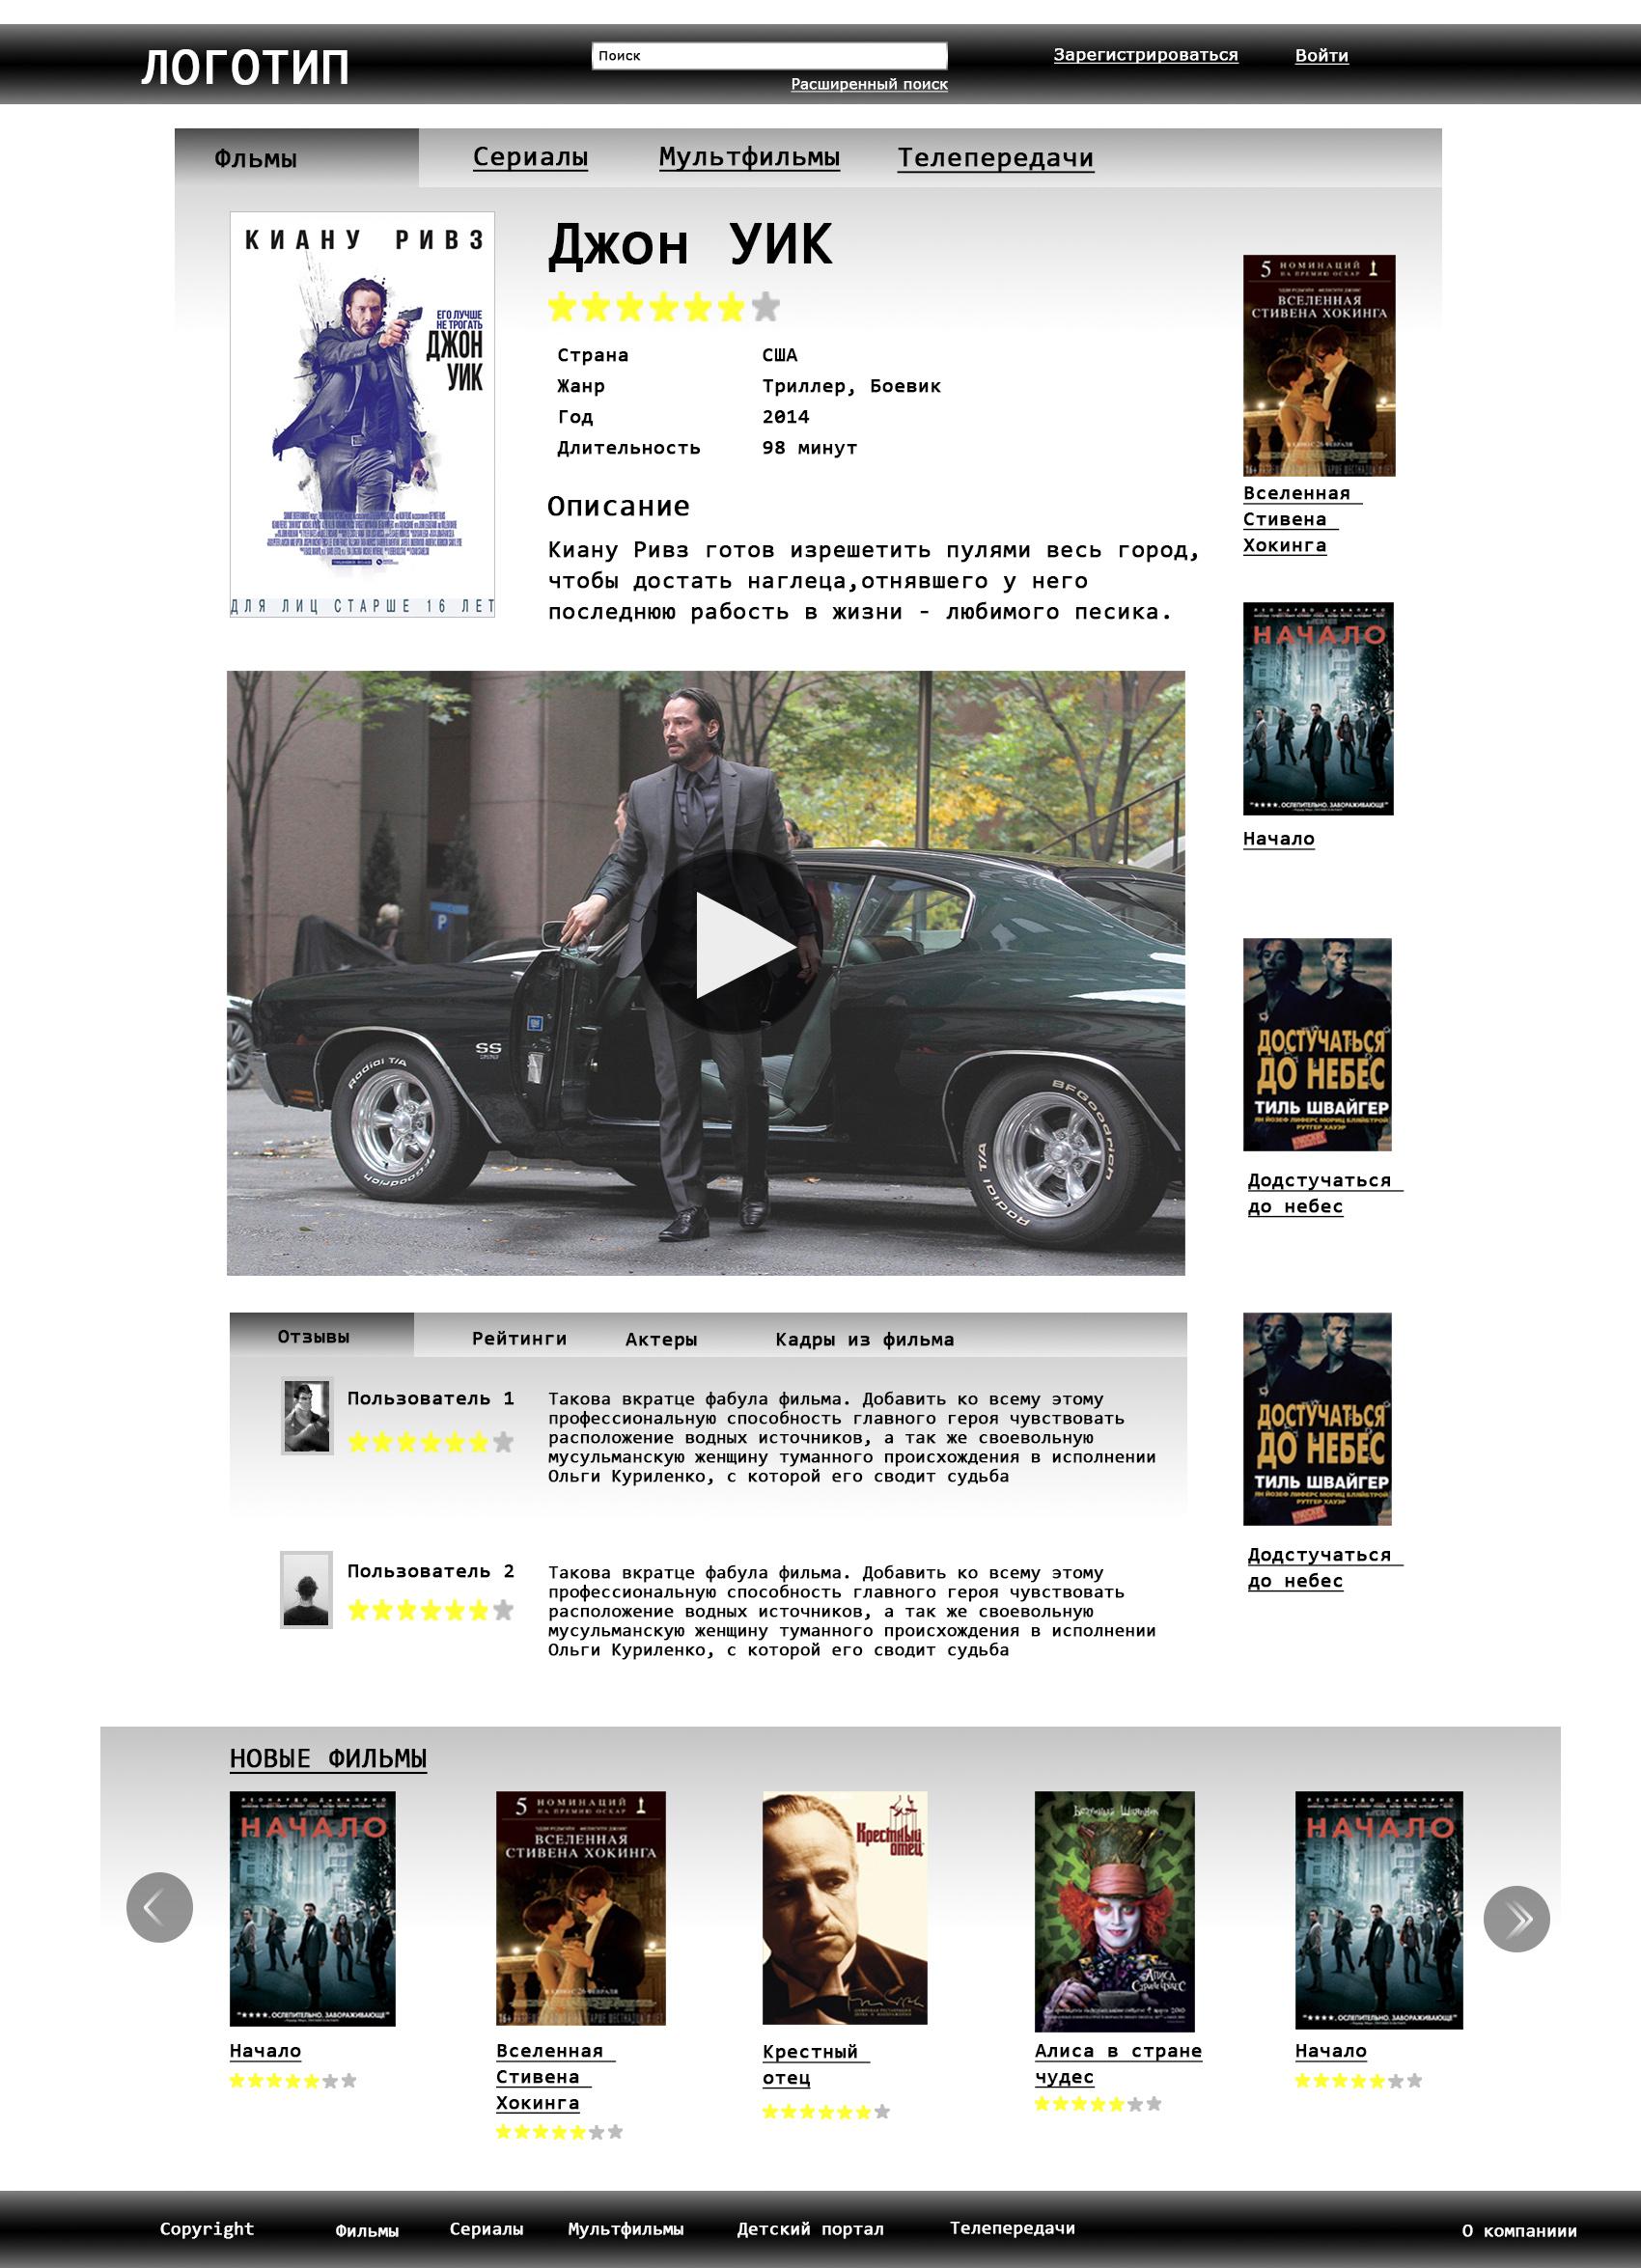 Дизайн для онлайн-кинотеатра фото f_9925527ffaee6cf2.jpg